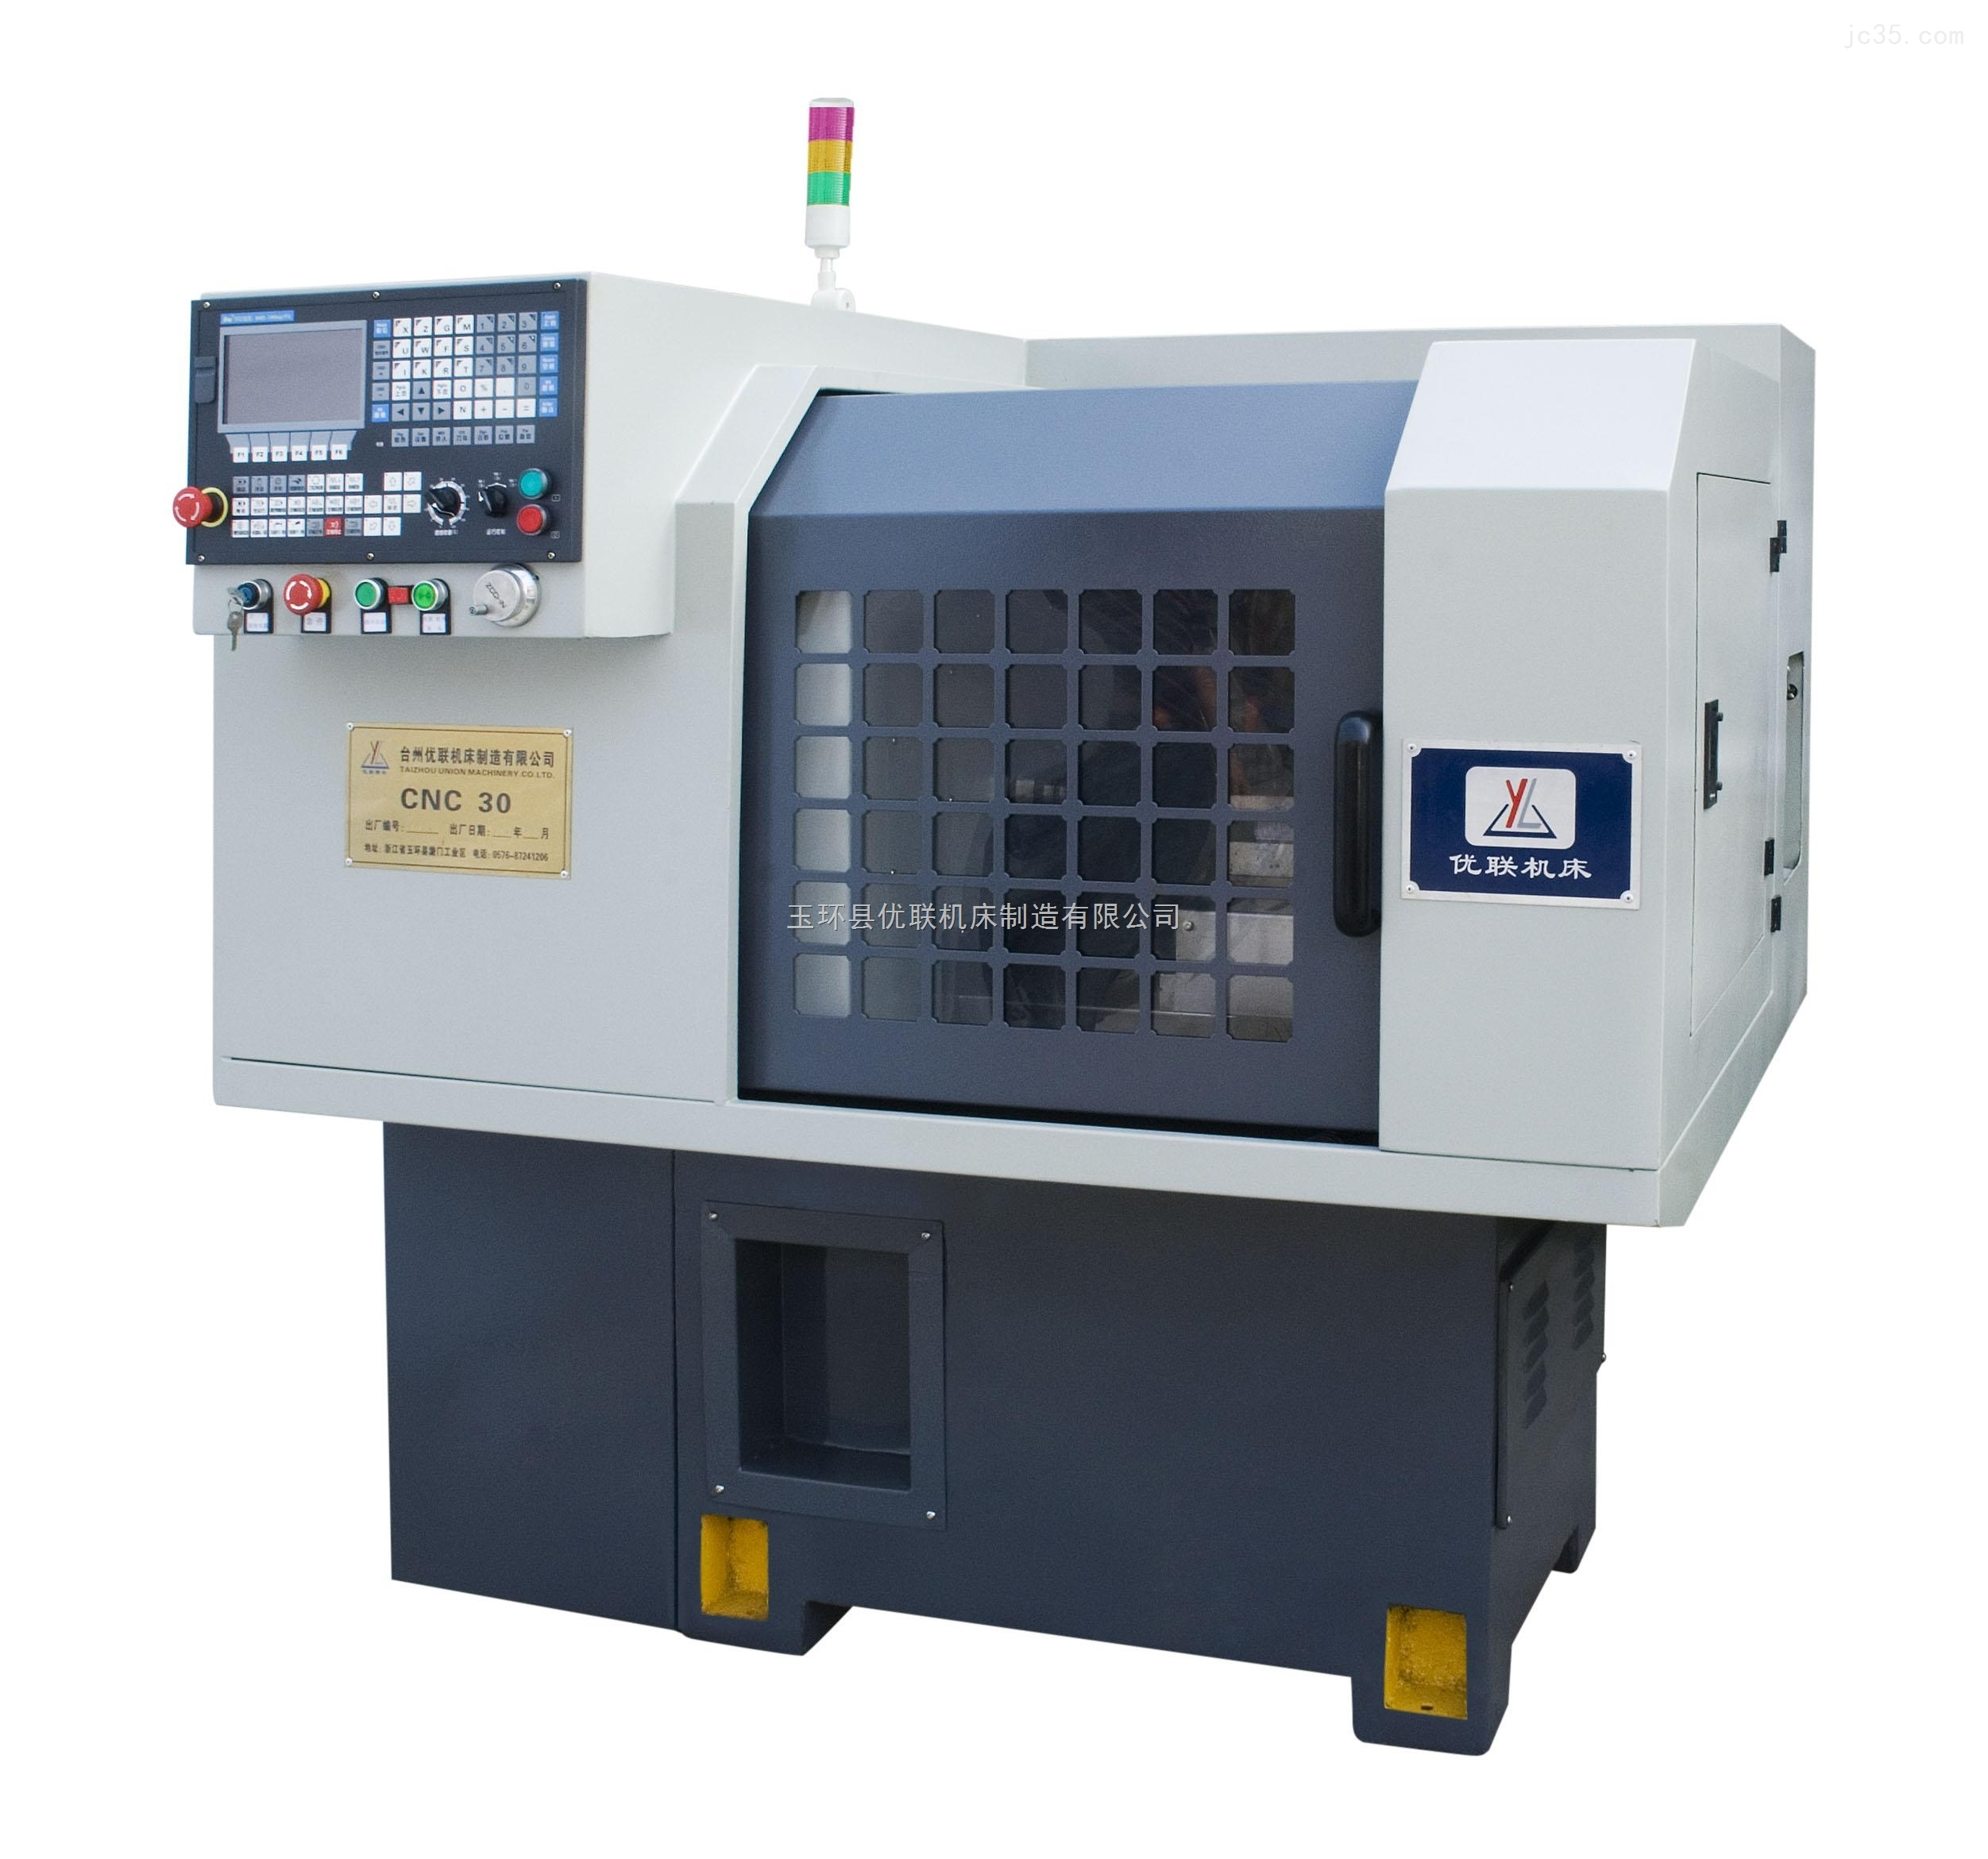 CNC经济型数控车床